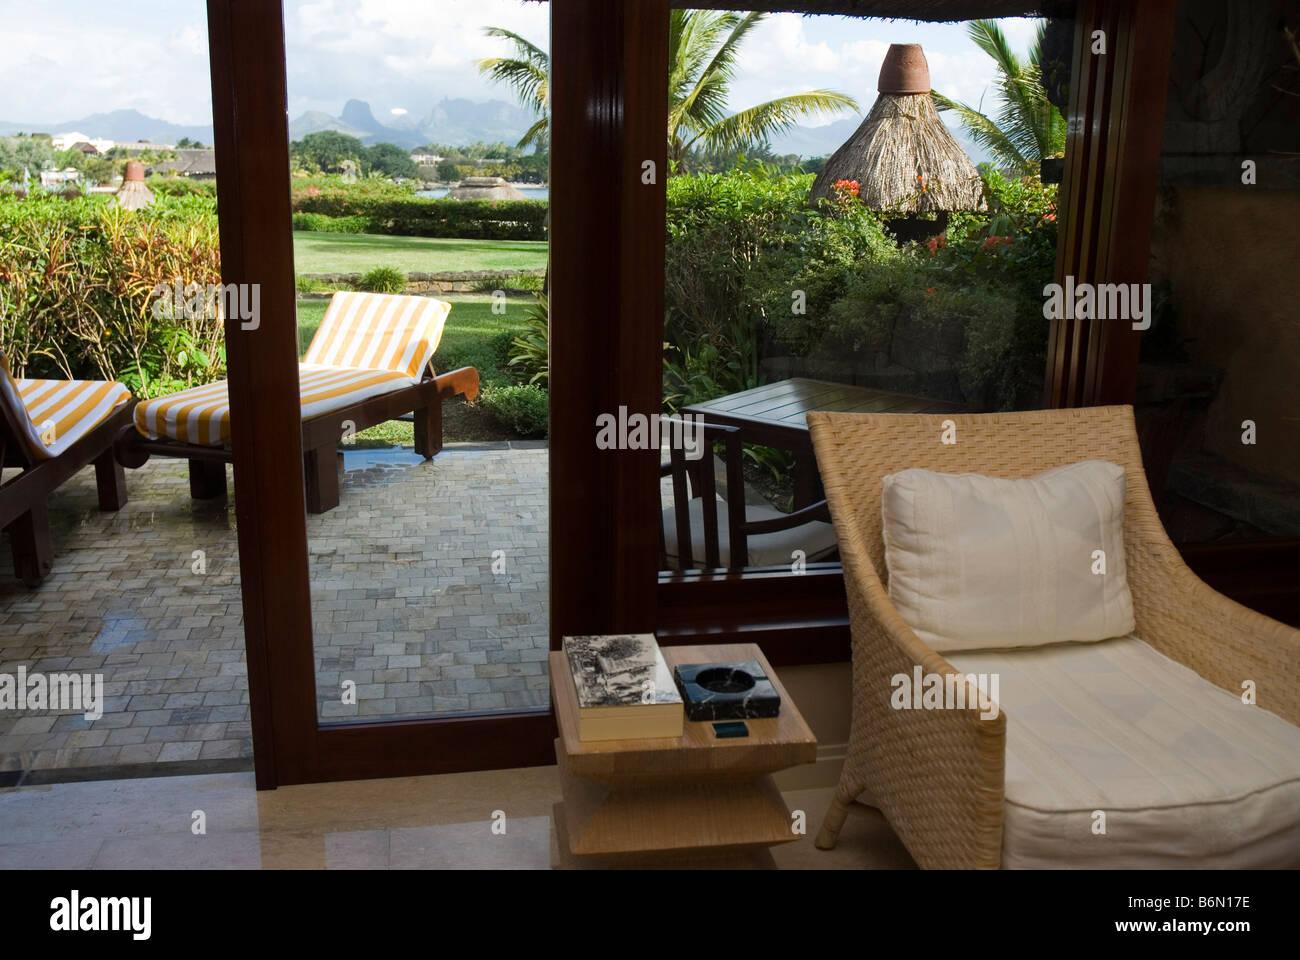 luxus pavillon zimmer garten hotel the oberoi in balaclava bereich insel mauritius stockfoto. Black Bedroom Furniture Sets. Home Design Ideas